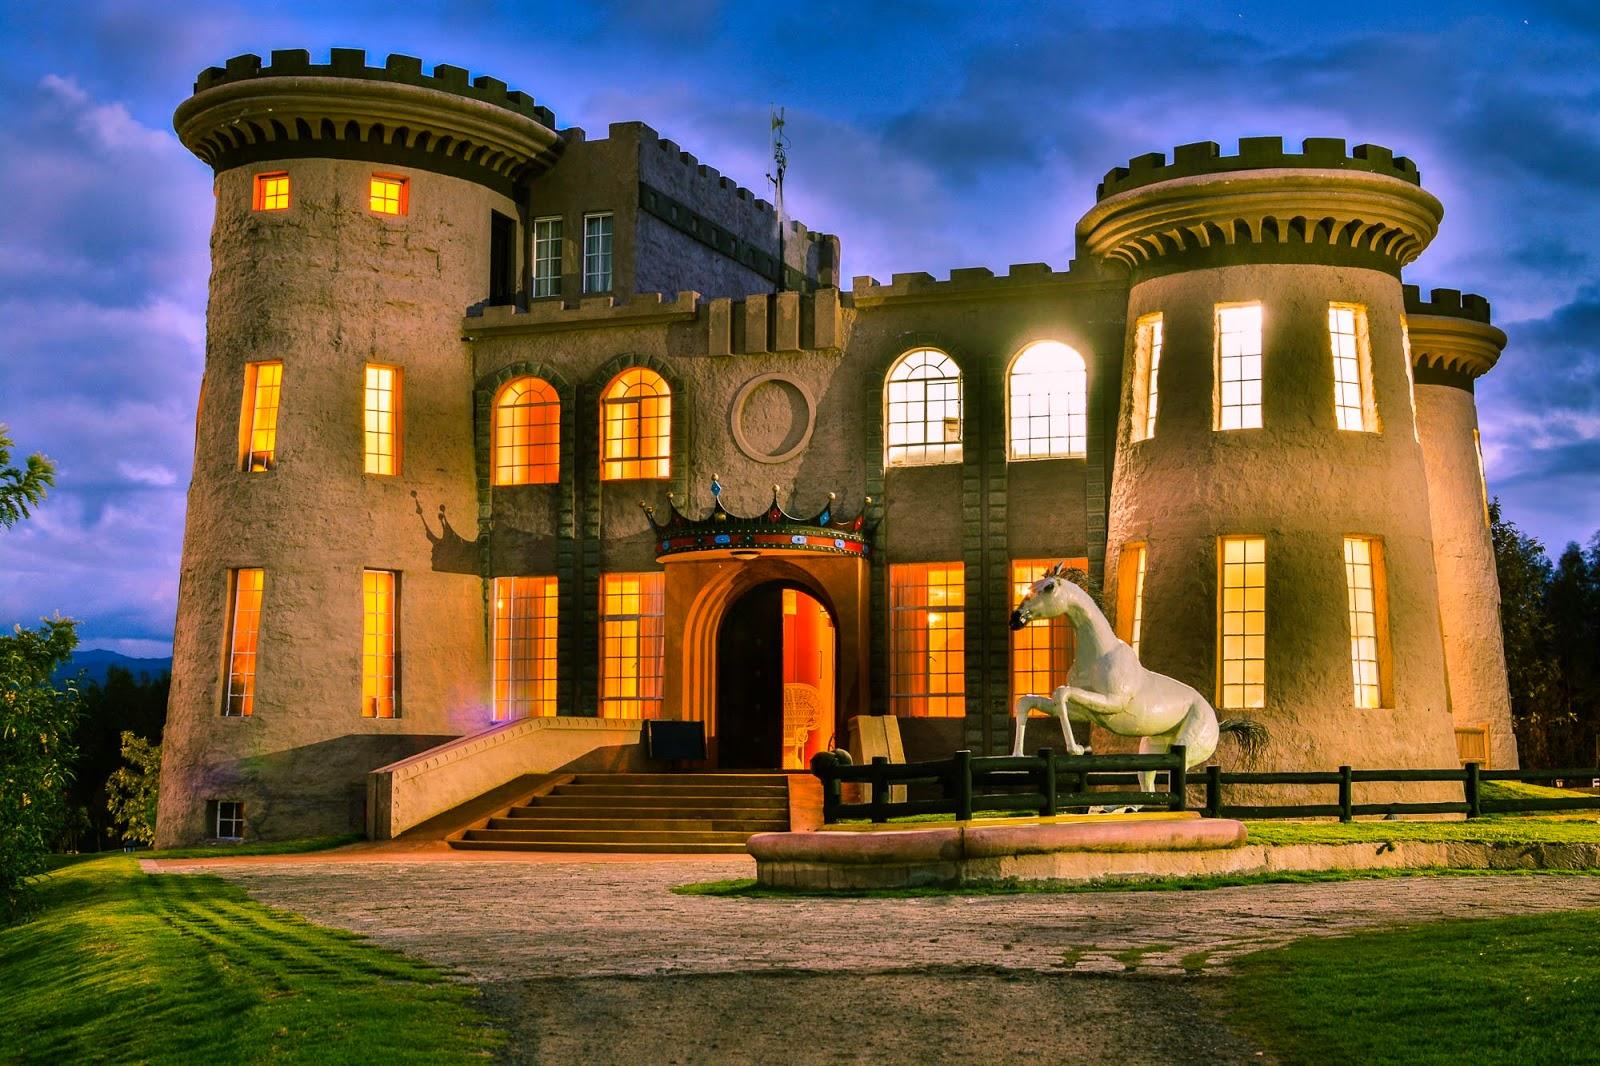 Tafaria Castle via @theMagunga